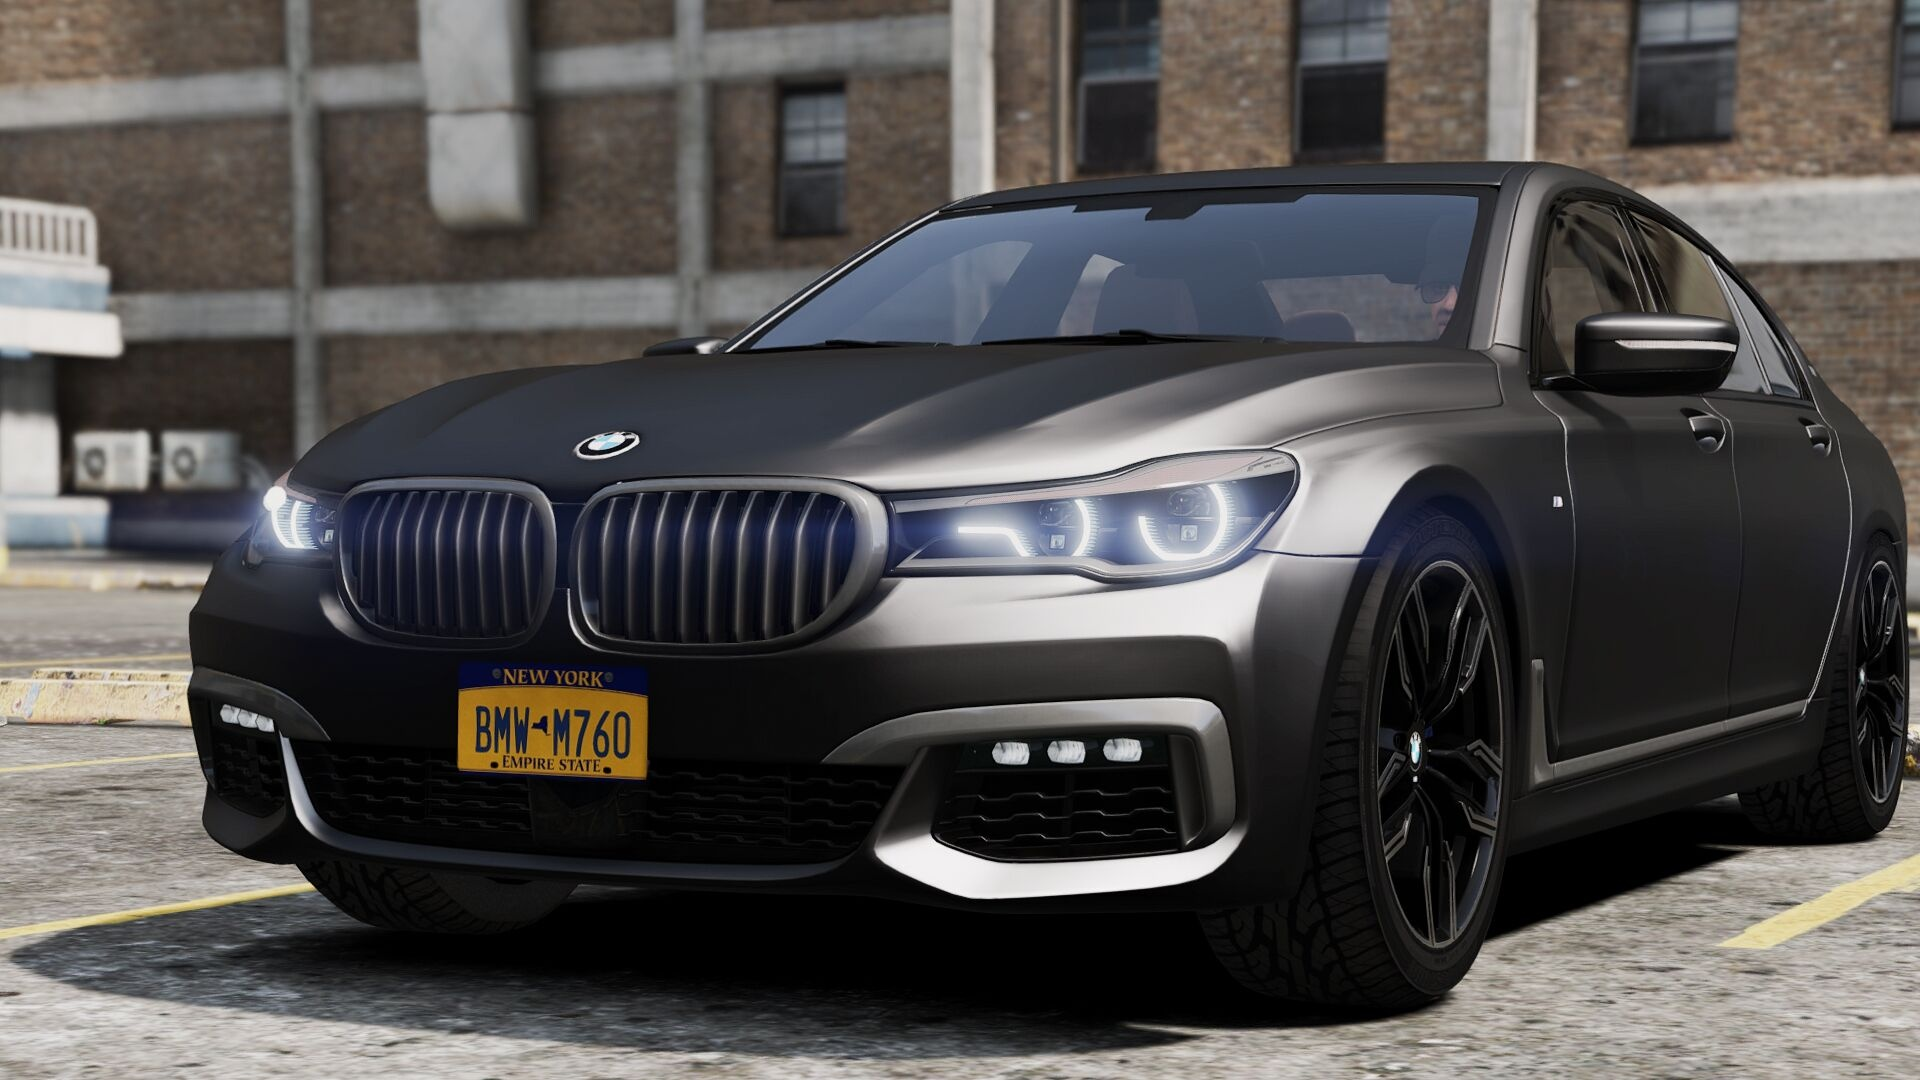 Top 10 Add-On Cars for GTA5 Redux - GTA 5 Redux